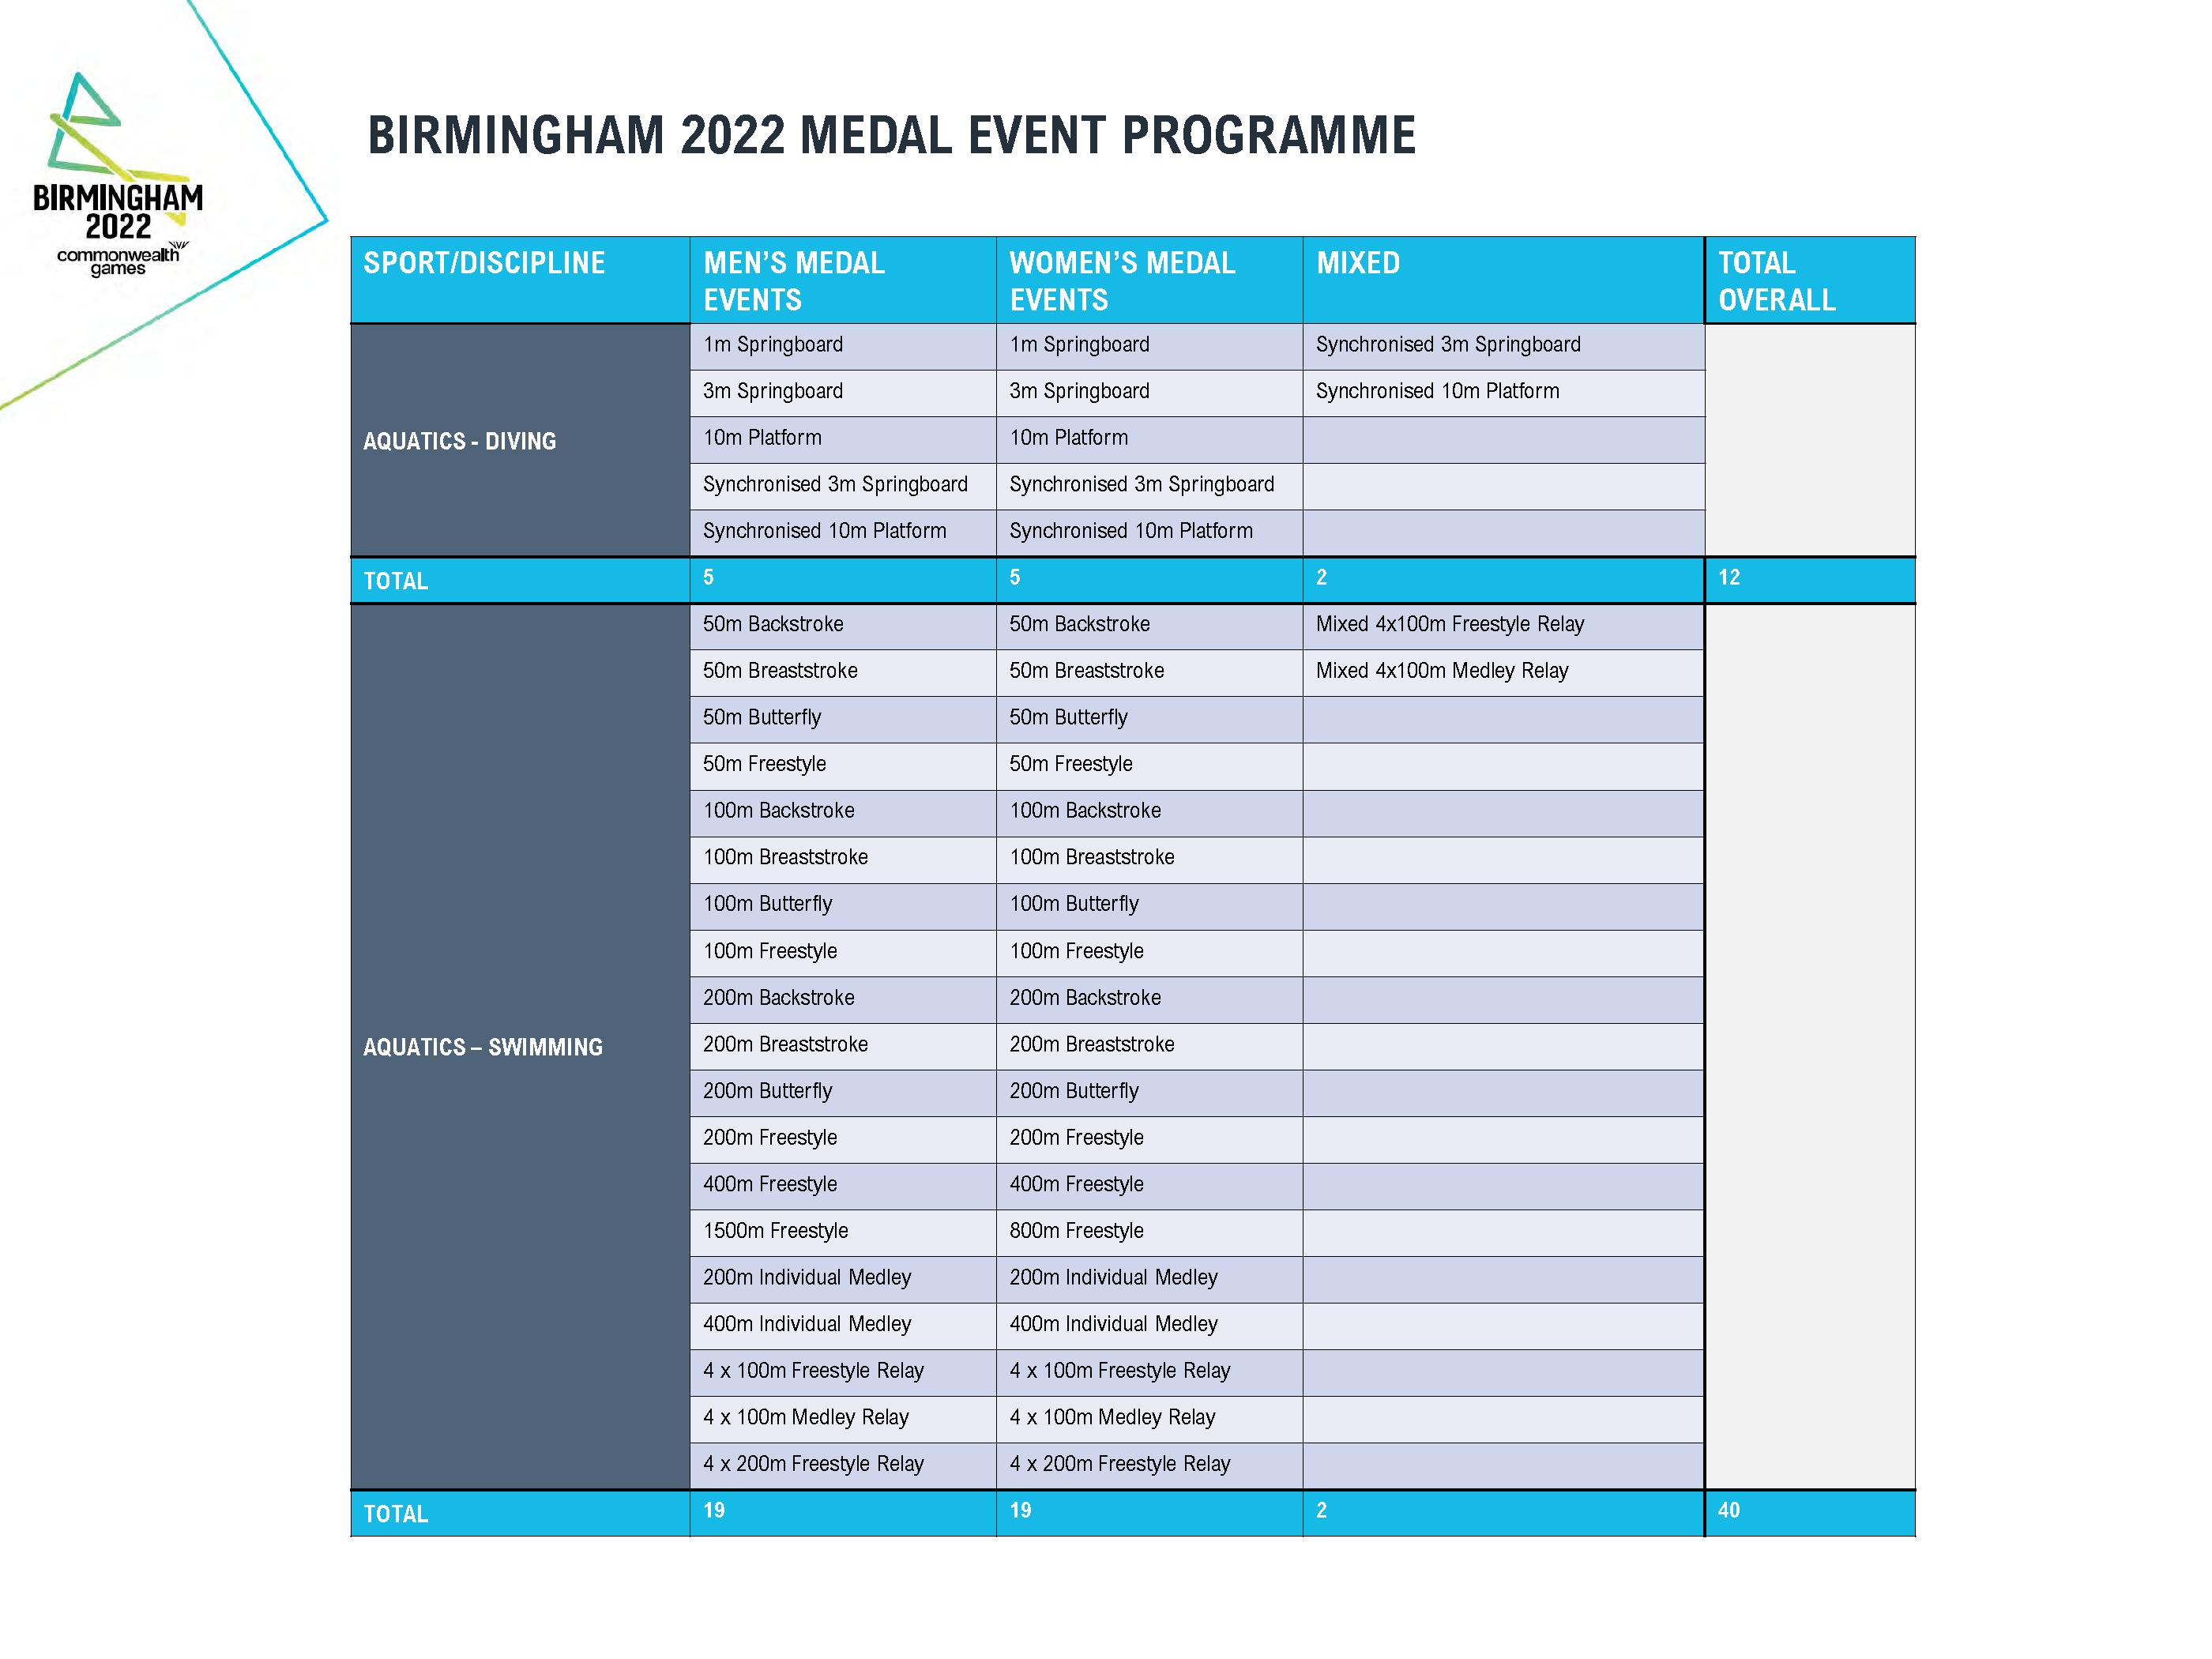 BIRMINGHAM 2022 MEDAL EVENT PROGRAMME.FINAL_Page_1